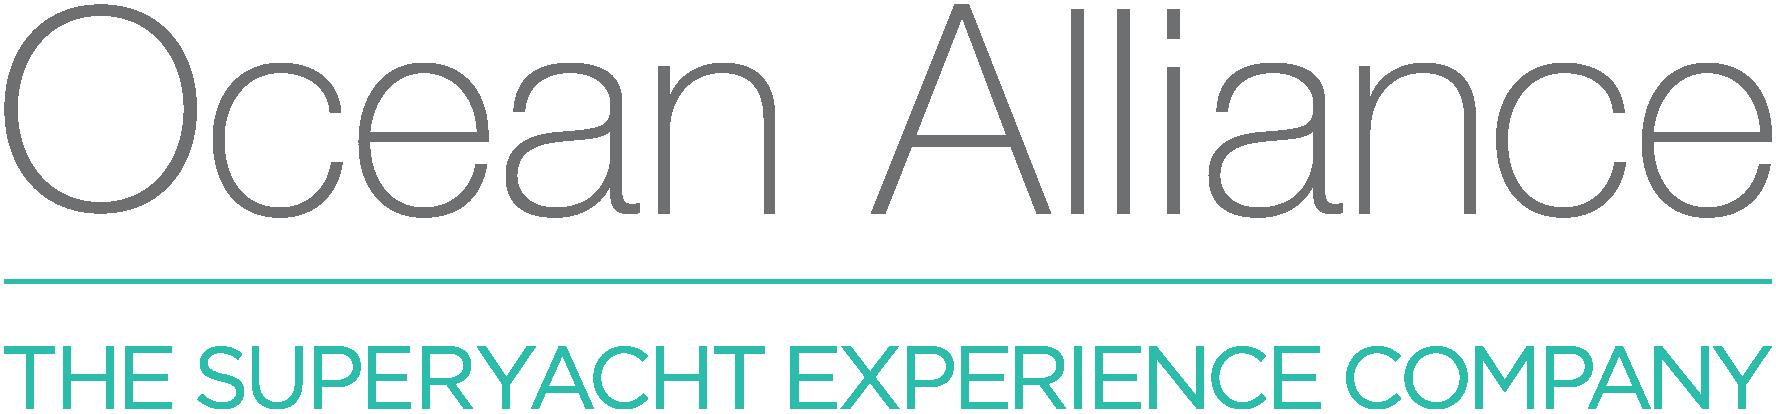 Ocean Alliance logo